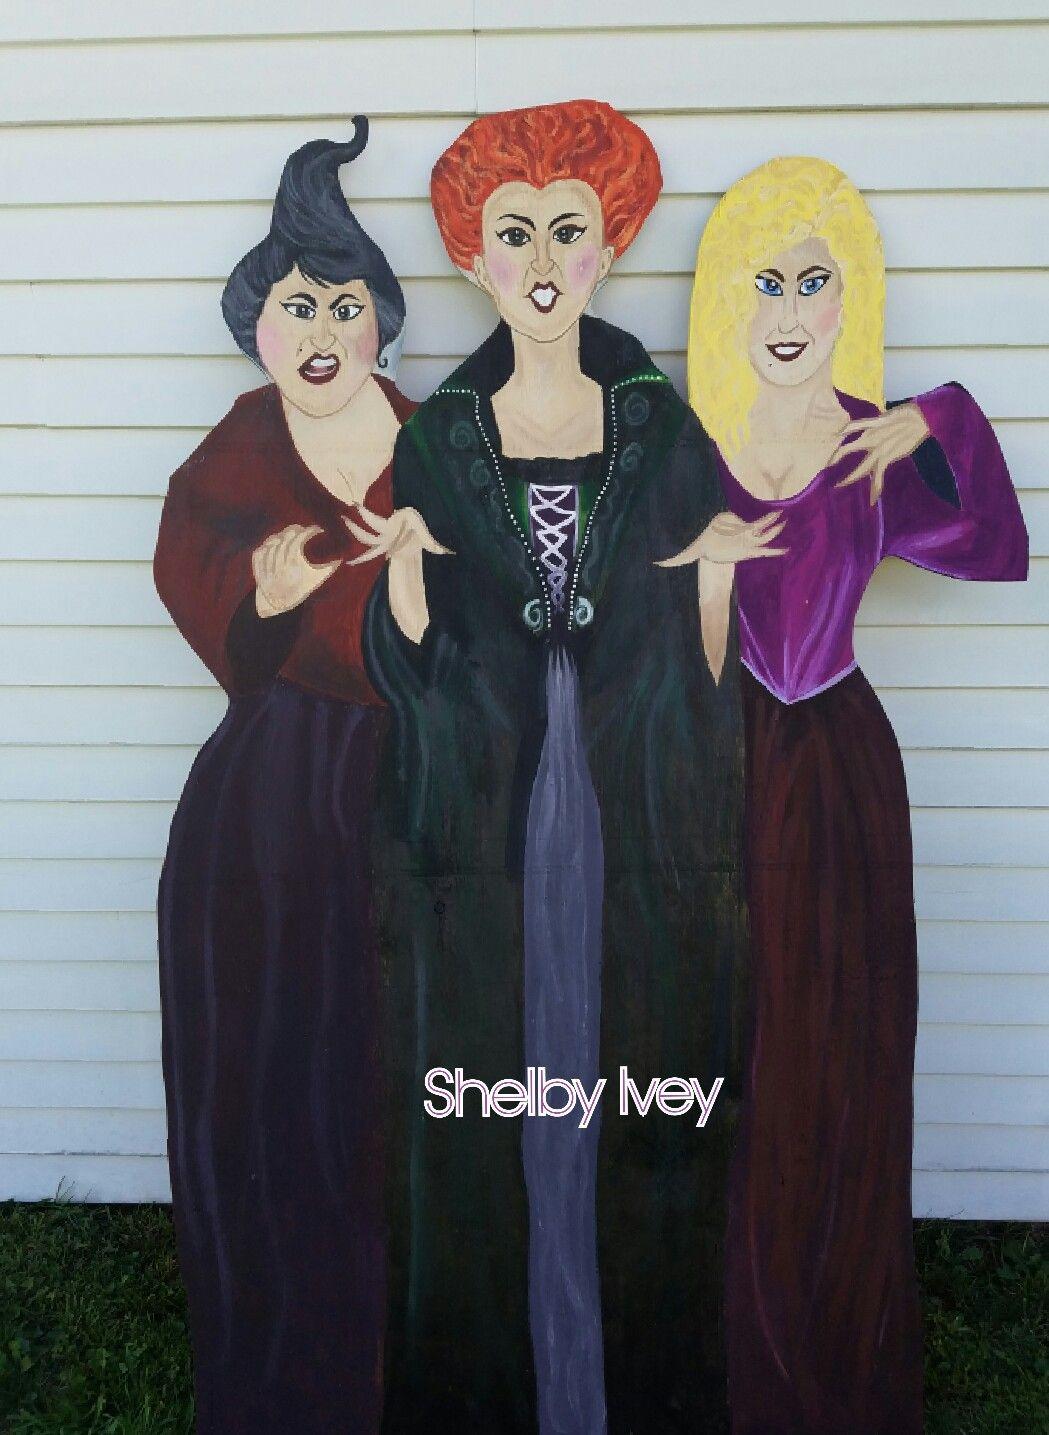 Sanderson Sisters Yard Outdoor Decoration 12.5 x 18 Inch AVOIN Halloween Hocus Pocus Garden Flag Vertical Double Sized